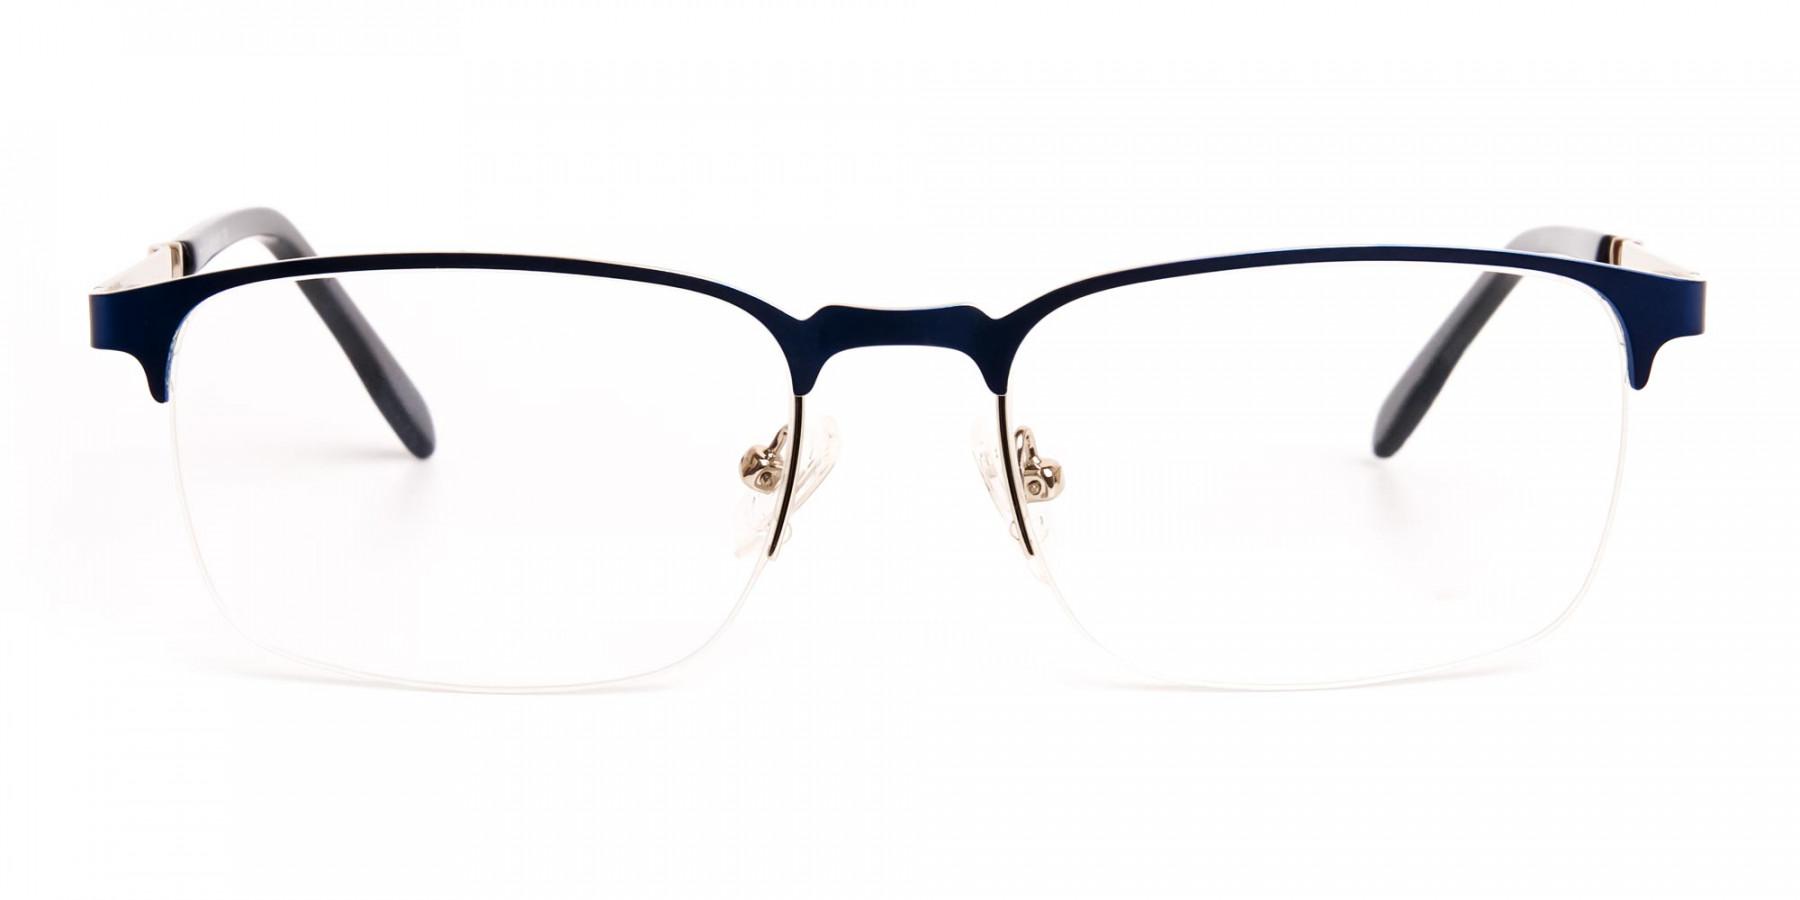 dark-and-navy-blue-rectangular-half-rim-glasses-frames -1